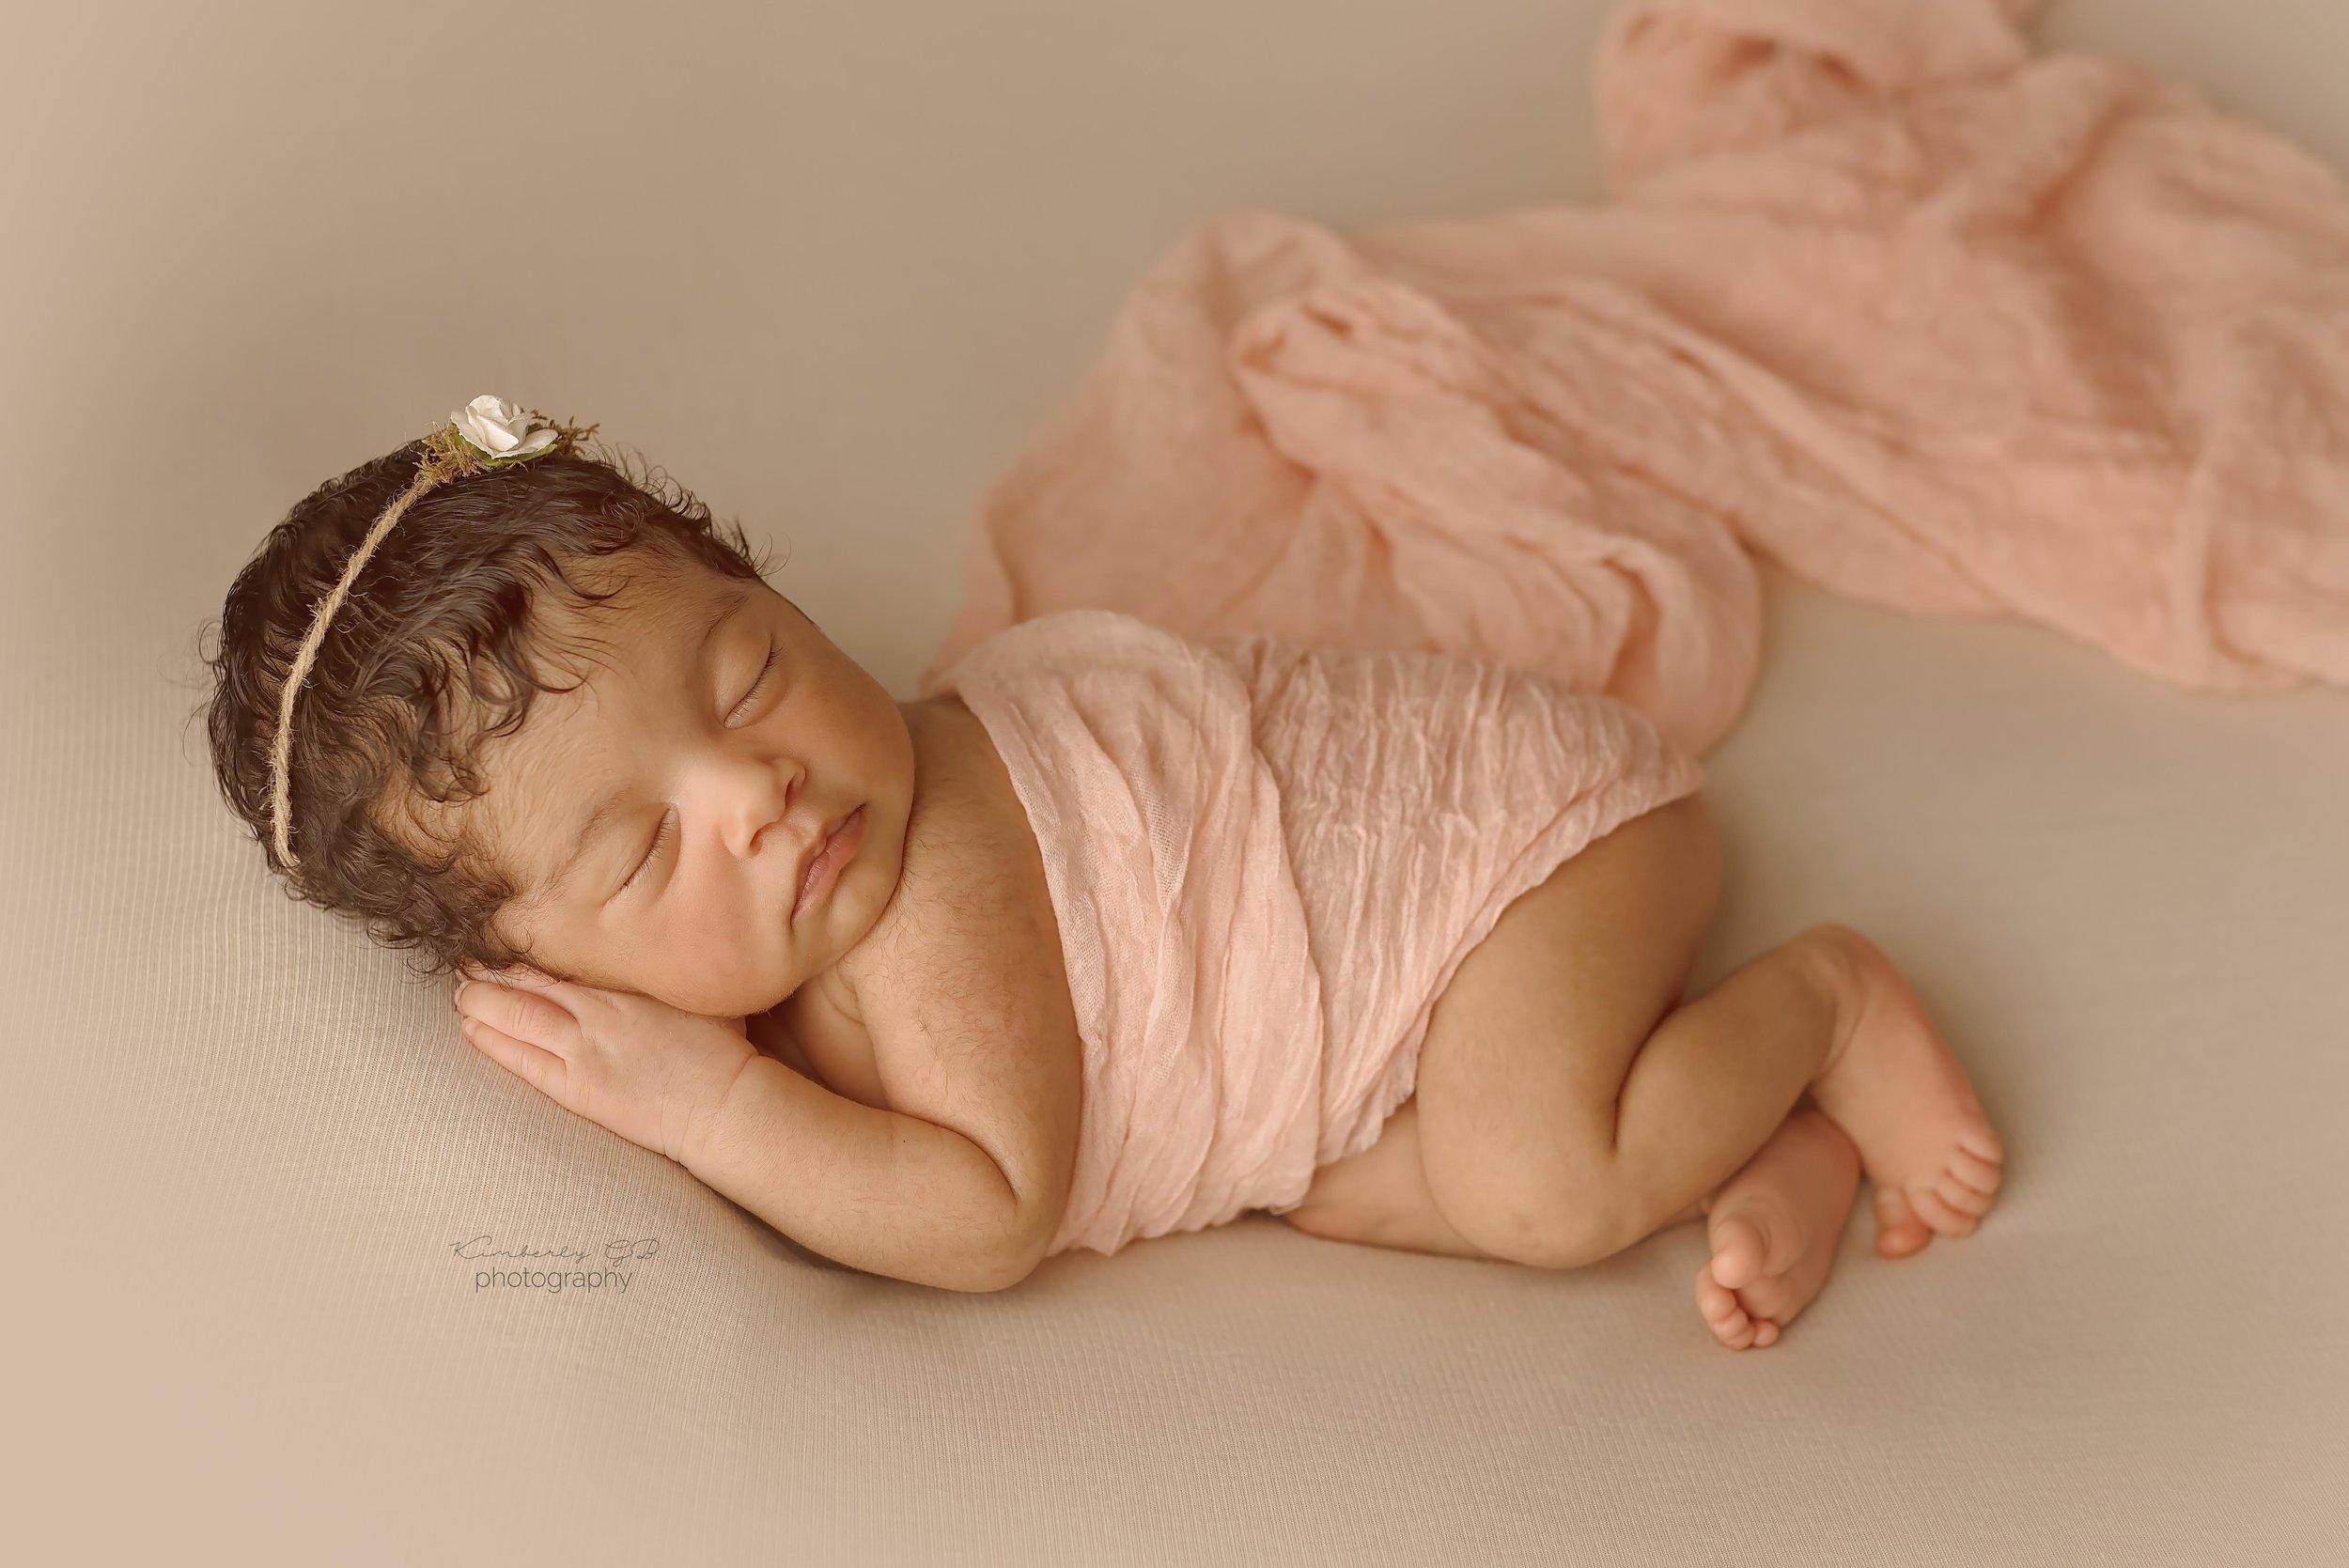 fotografia-de-recien-nacidos-bebes-newborn-en-puerto-rico-kimberly-gb-photography-fotografa-112.jpg